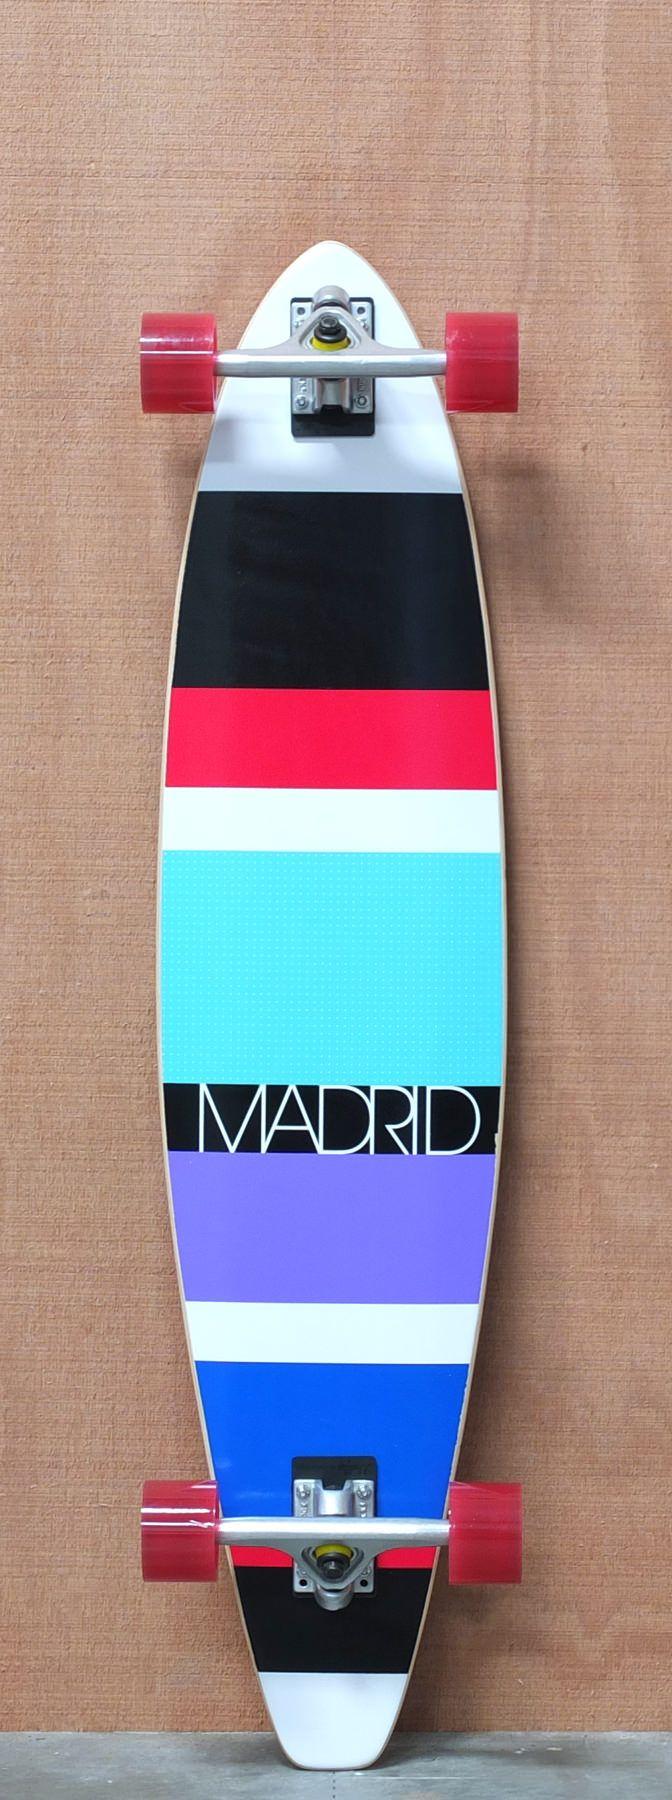 "Madrid 42"" Stripes 2 Longboard Complete"